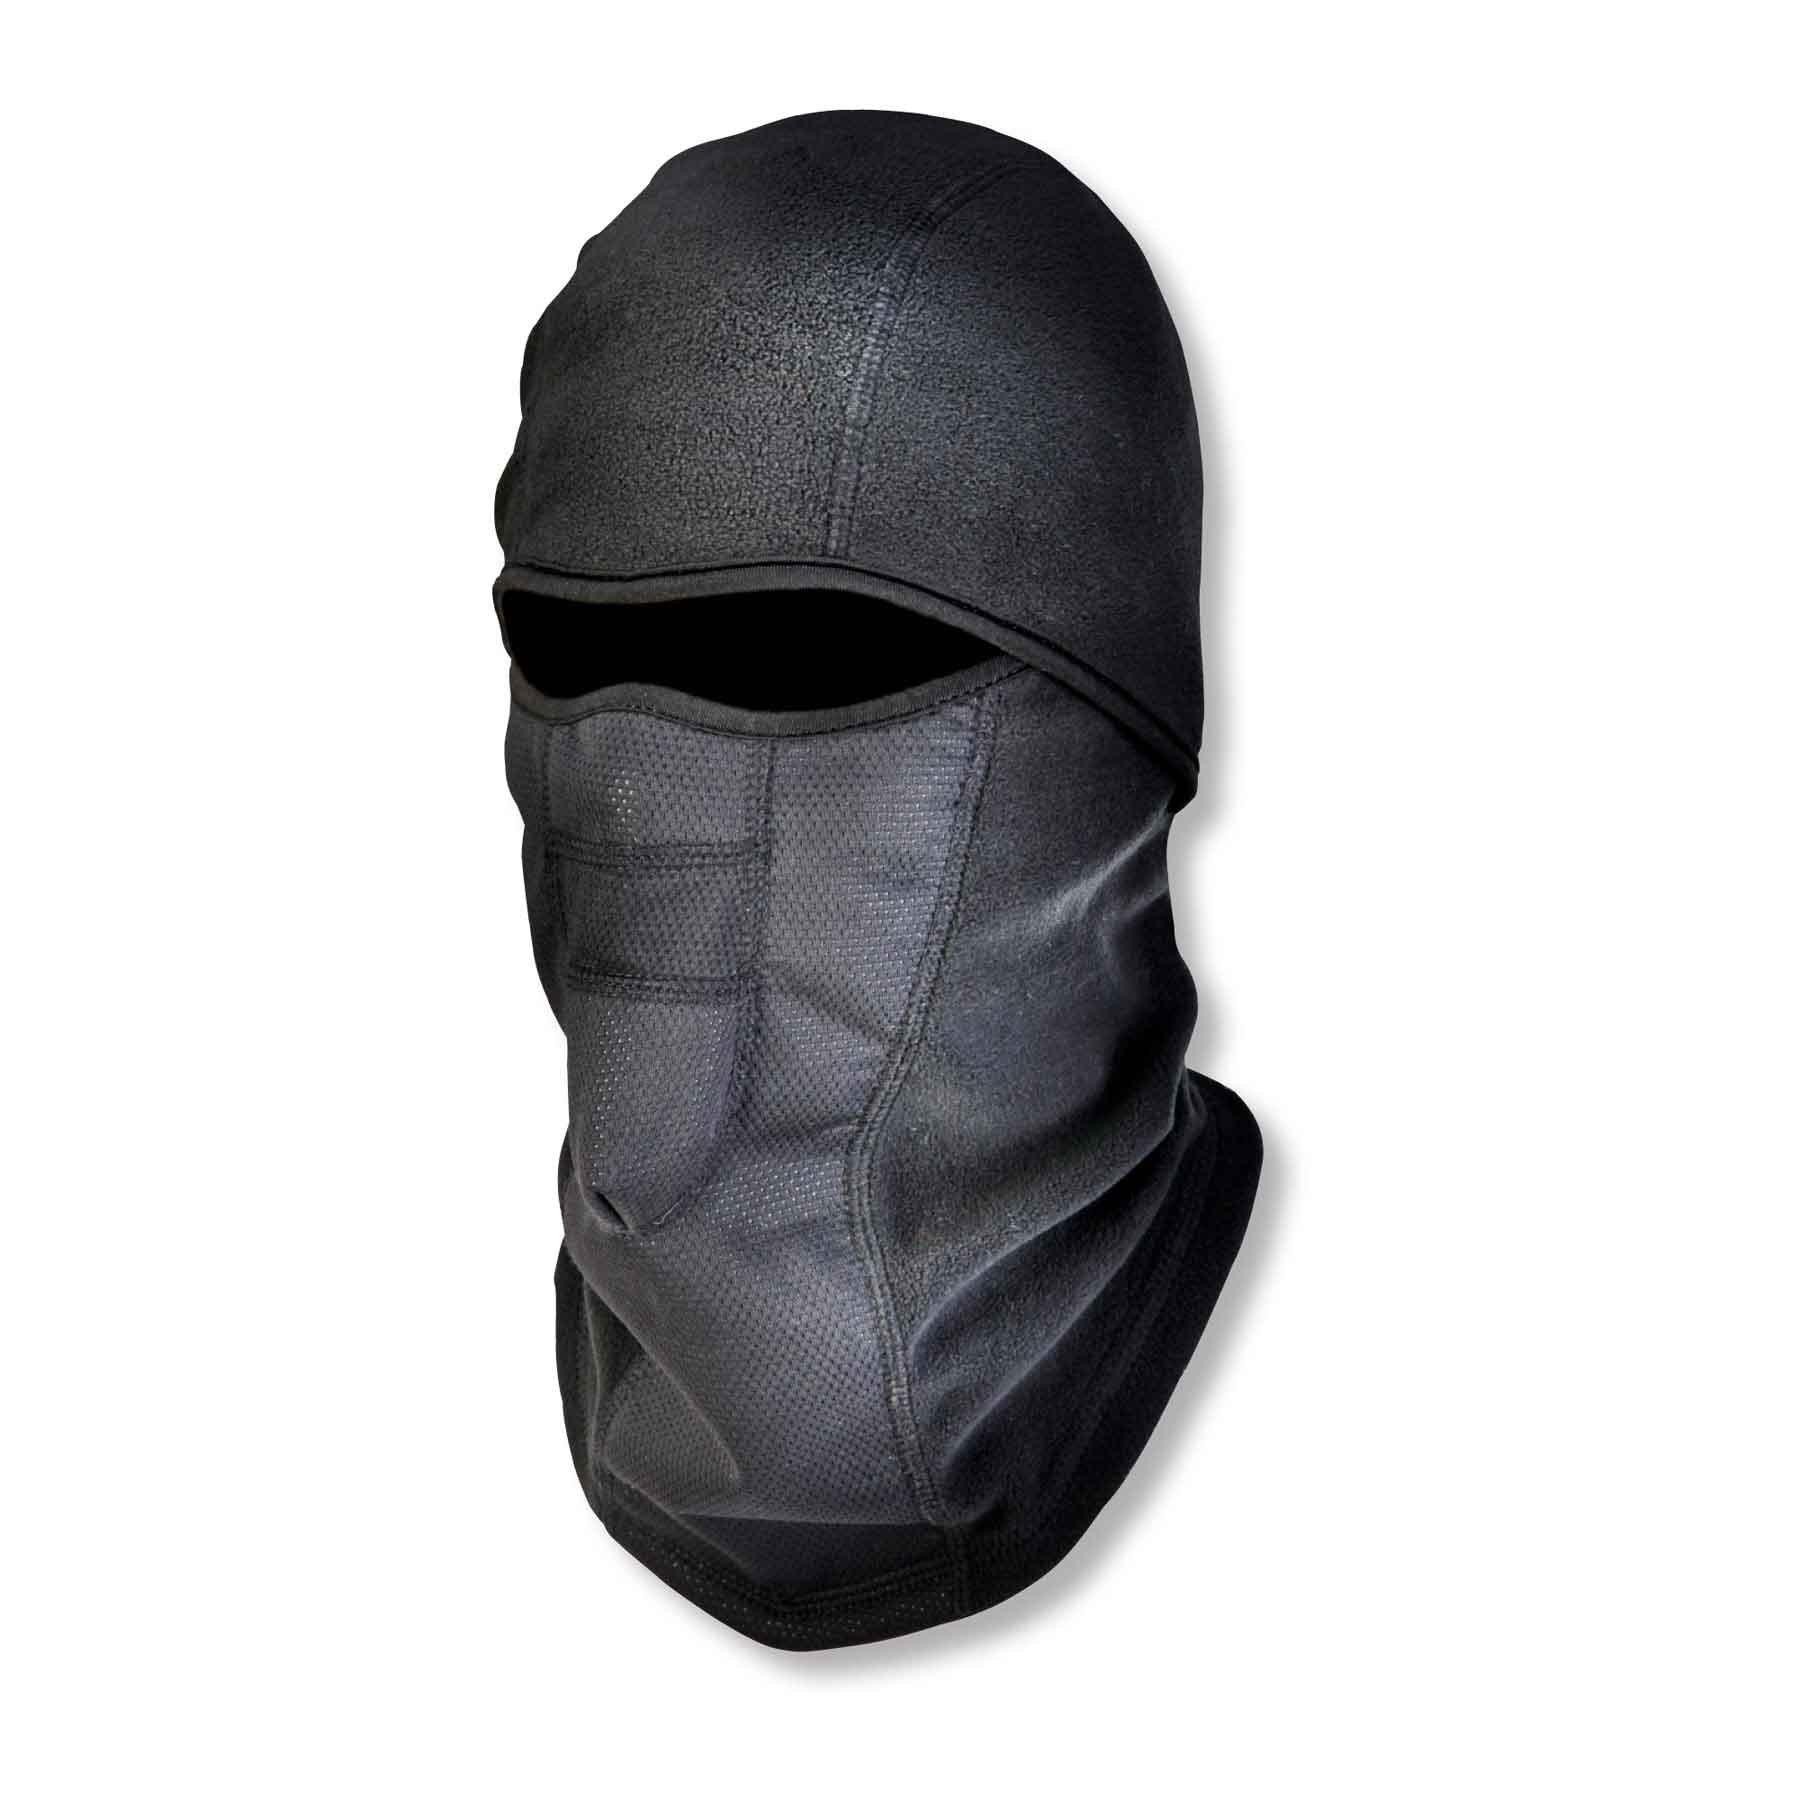 Ergodyne N-Ferno 6823 Winter Balaclava Ski Mask, Wind-Resistant Face Mask, Thermal Fleece, Black by Ergodyne